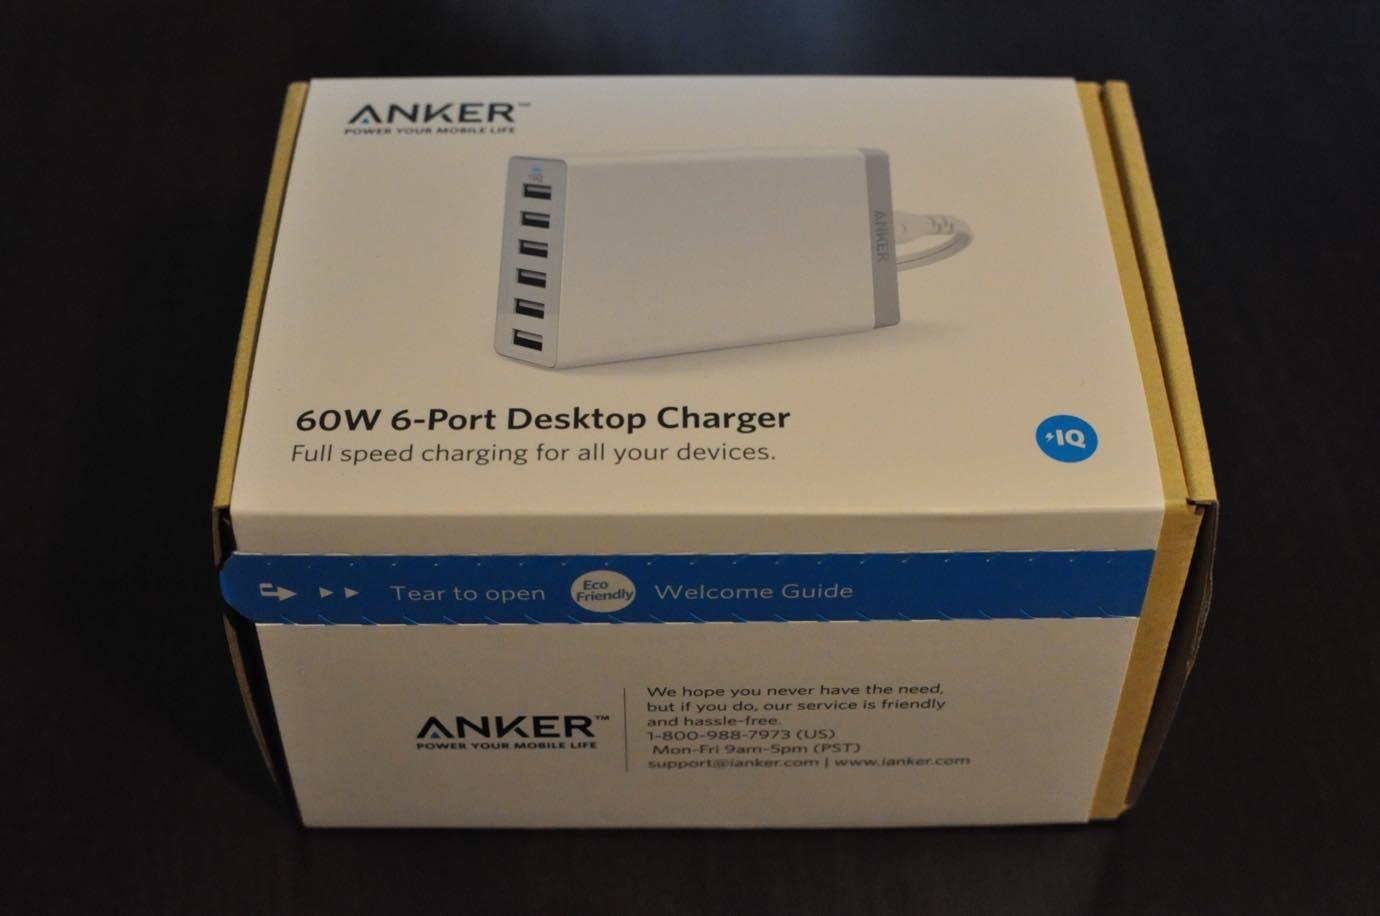 Anker 60W 6ポート USB急速充電器 12 20150808 135911